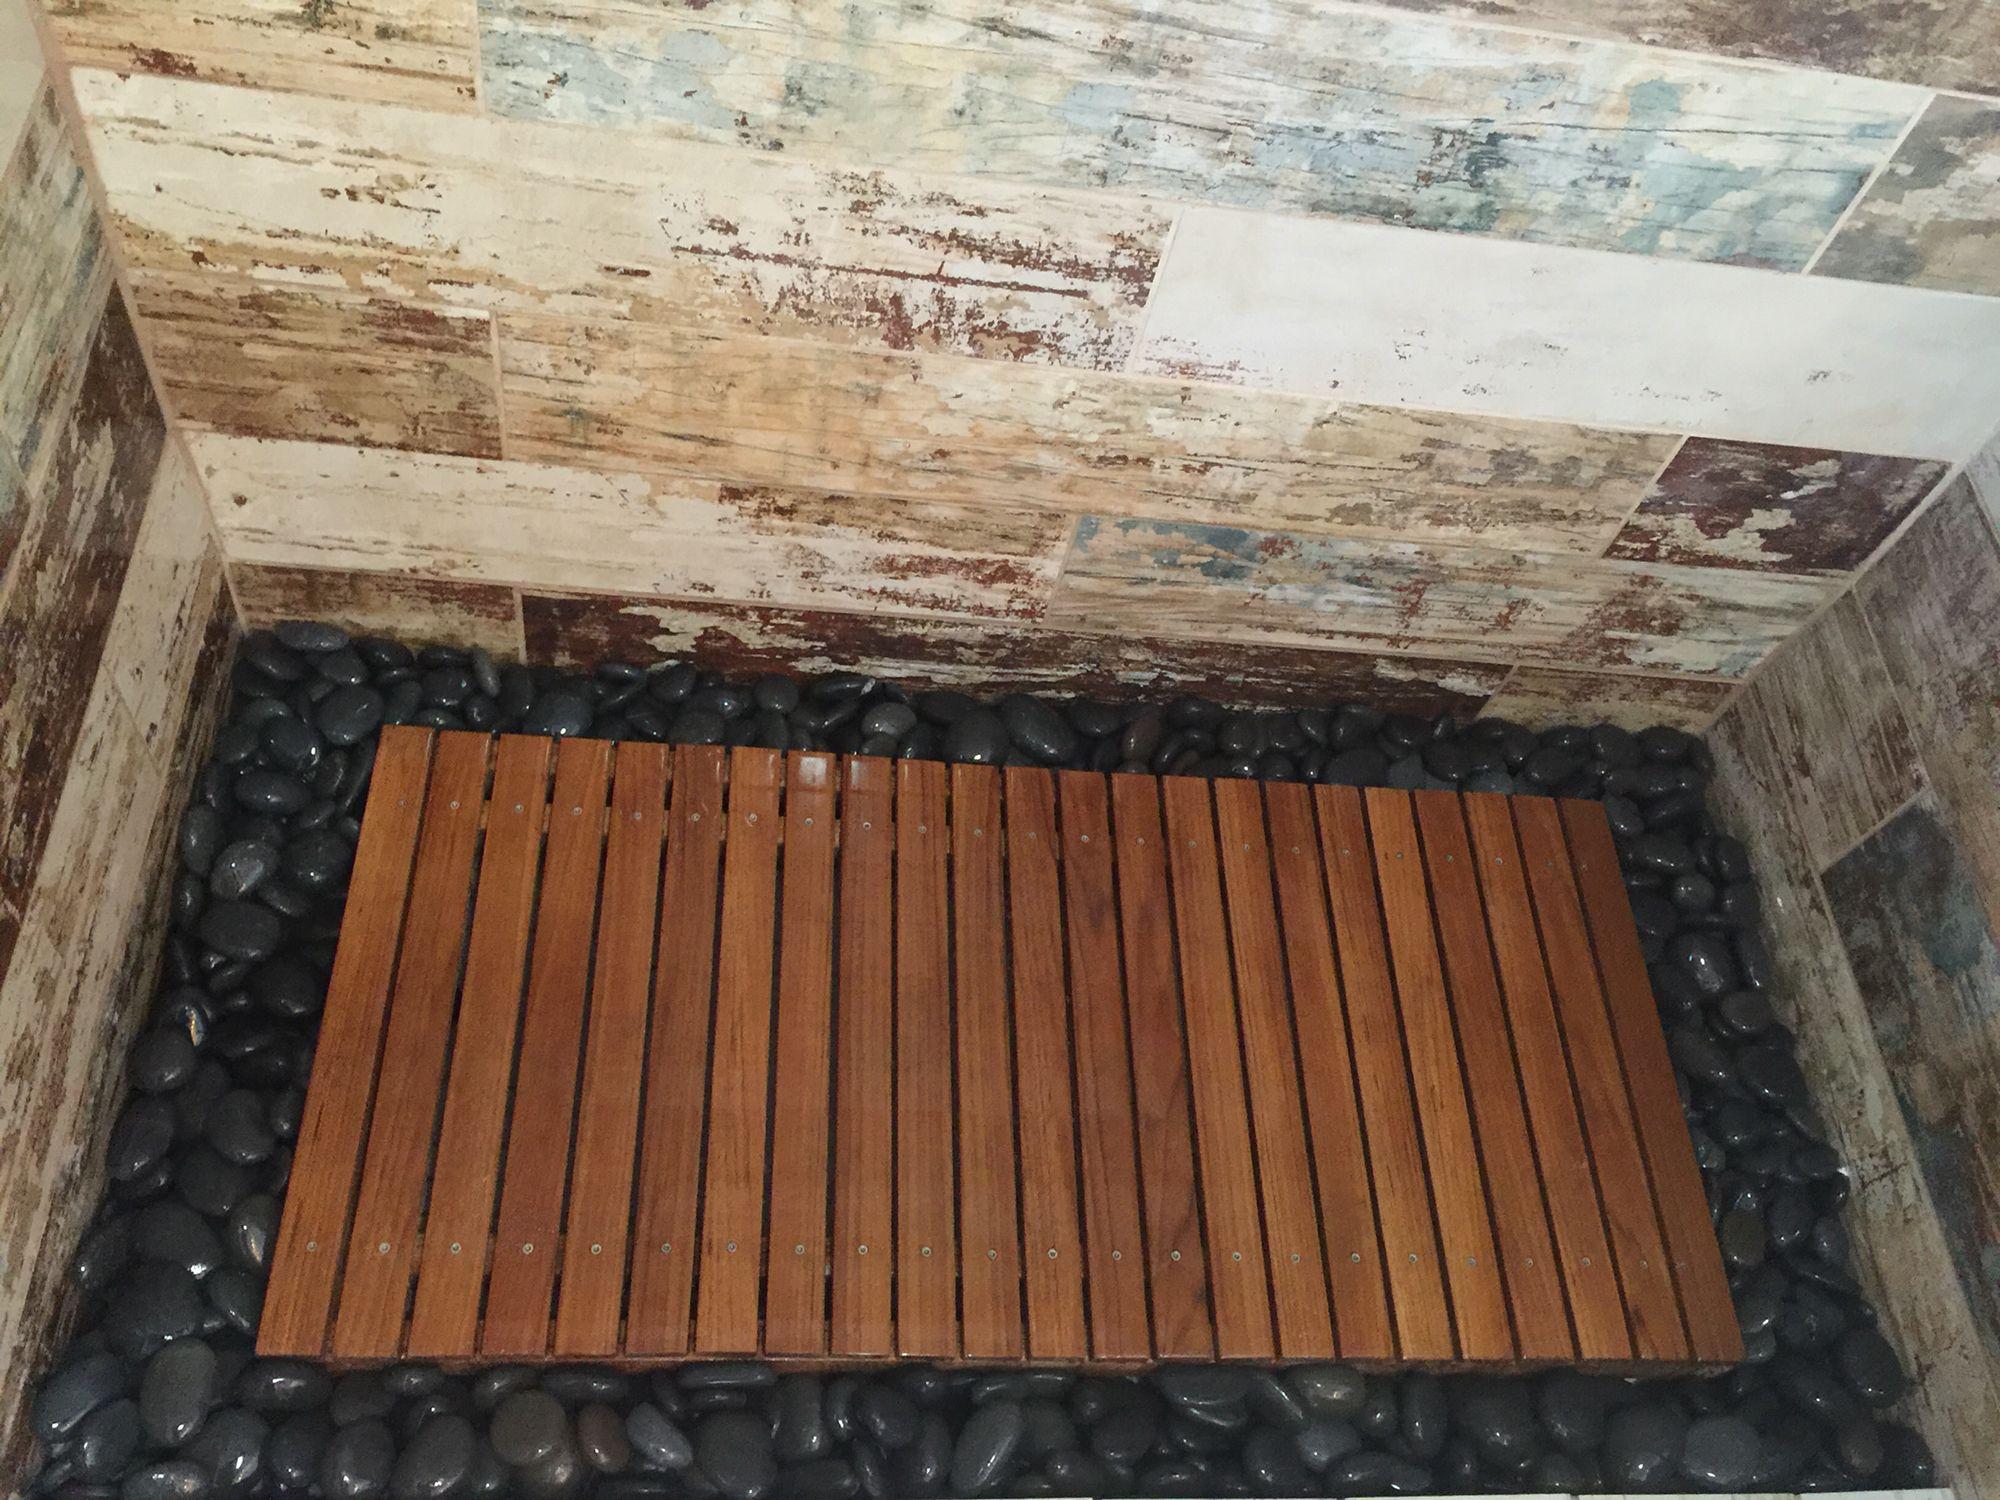 Teak Wood Shower Floor Surrounded By River Rock Walls Tiles In Ceramic Bar Wood Tile Designed By Krysten Pet